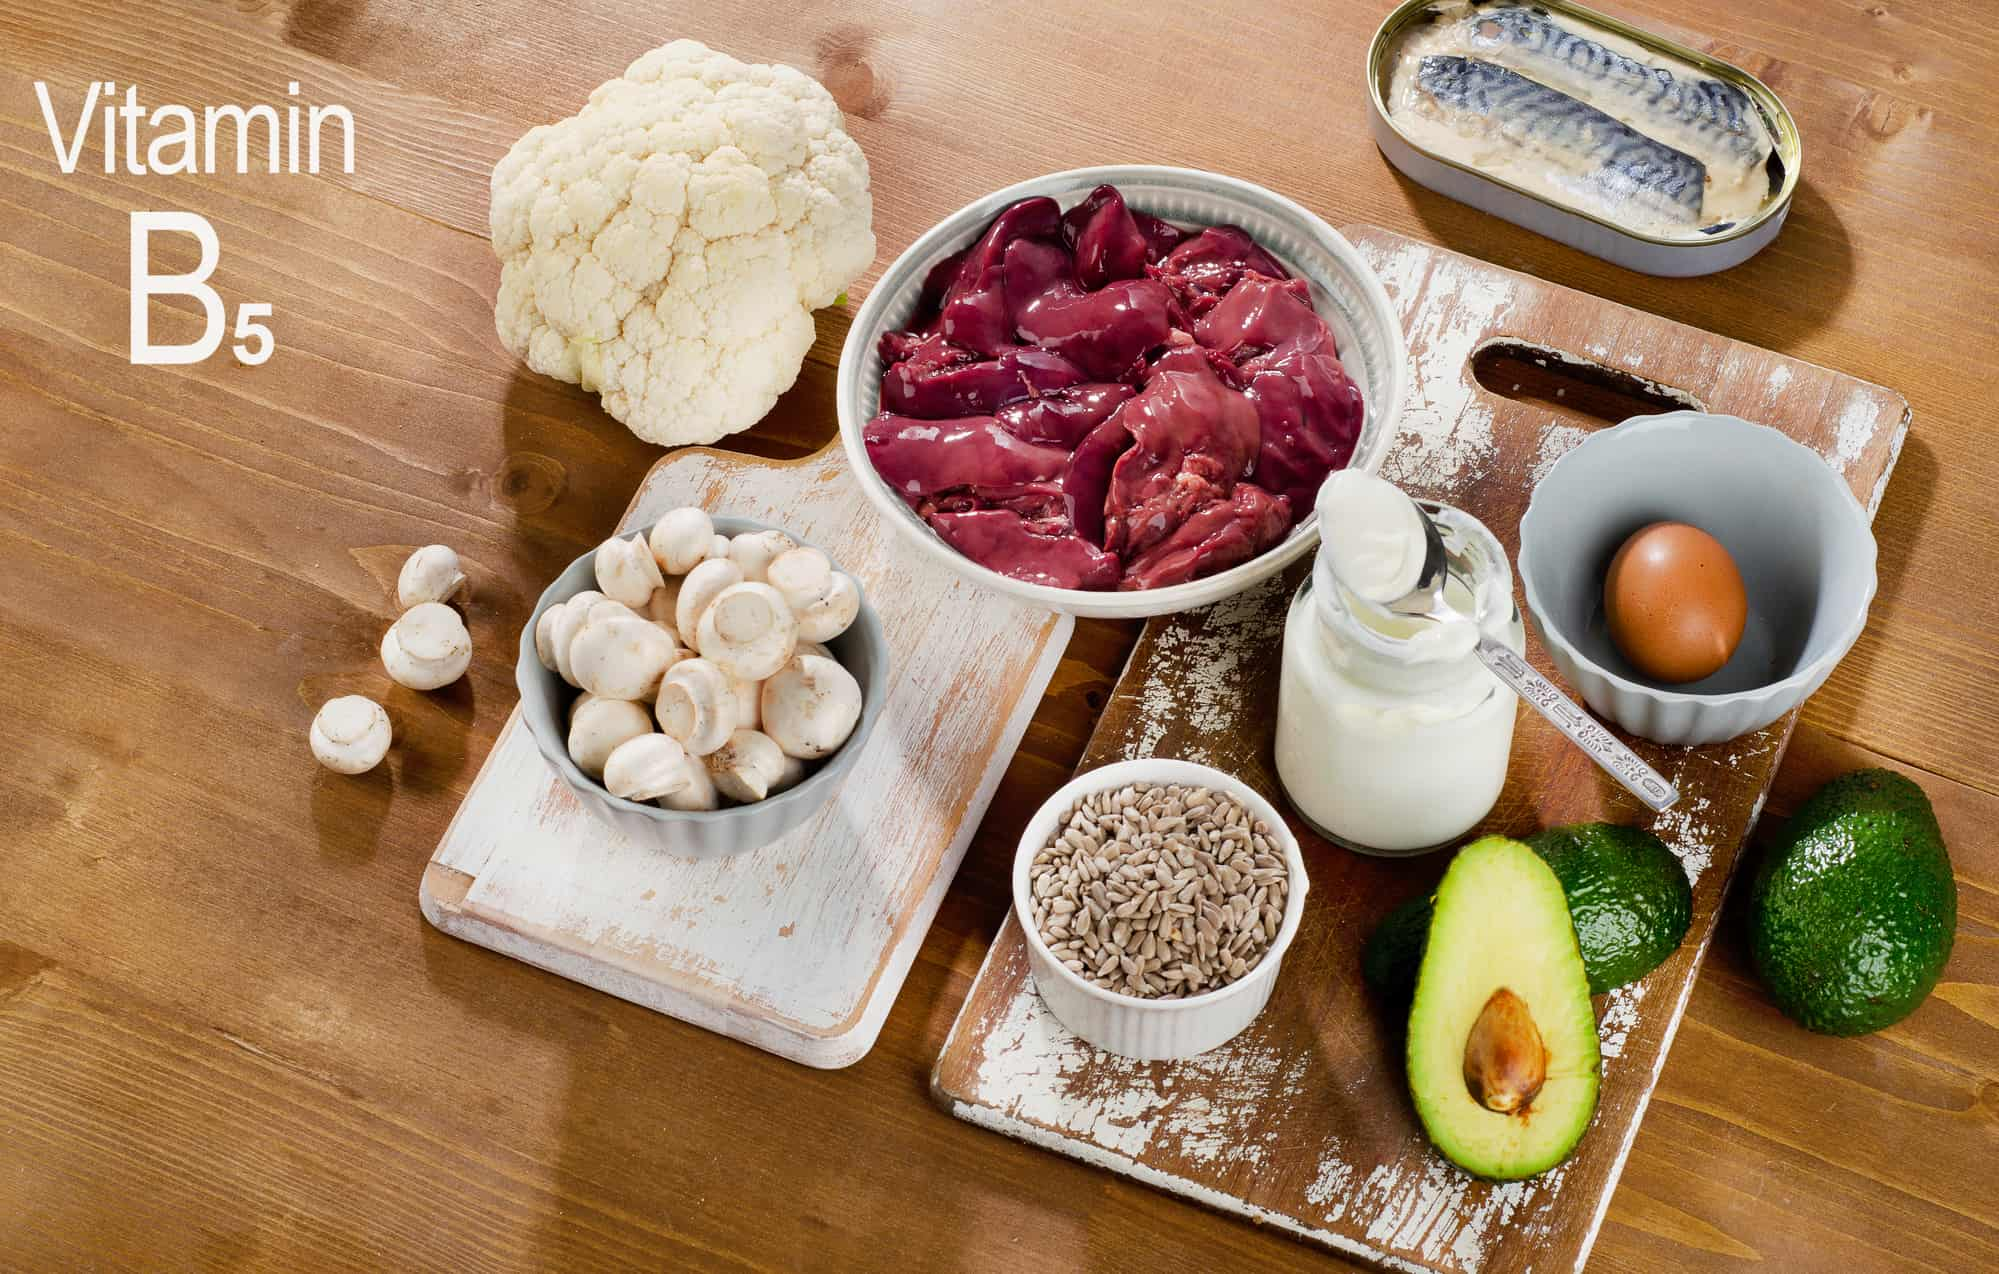 Foods Highest in Vitamin B5 (Pantothenic Acid) on wooden board